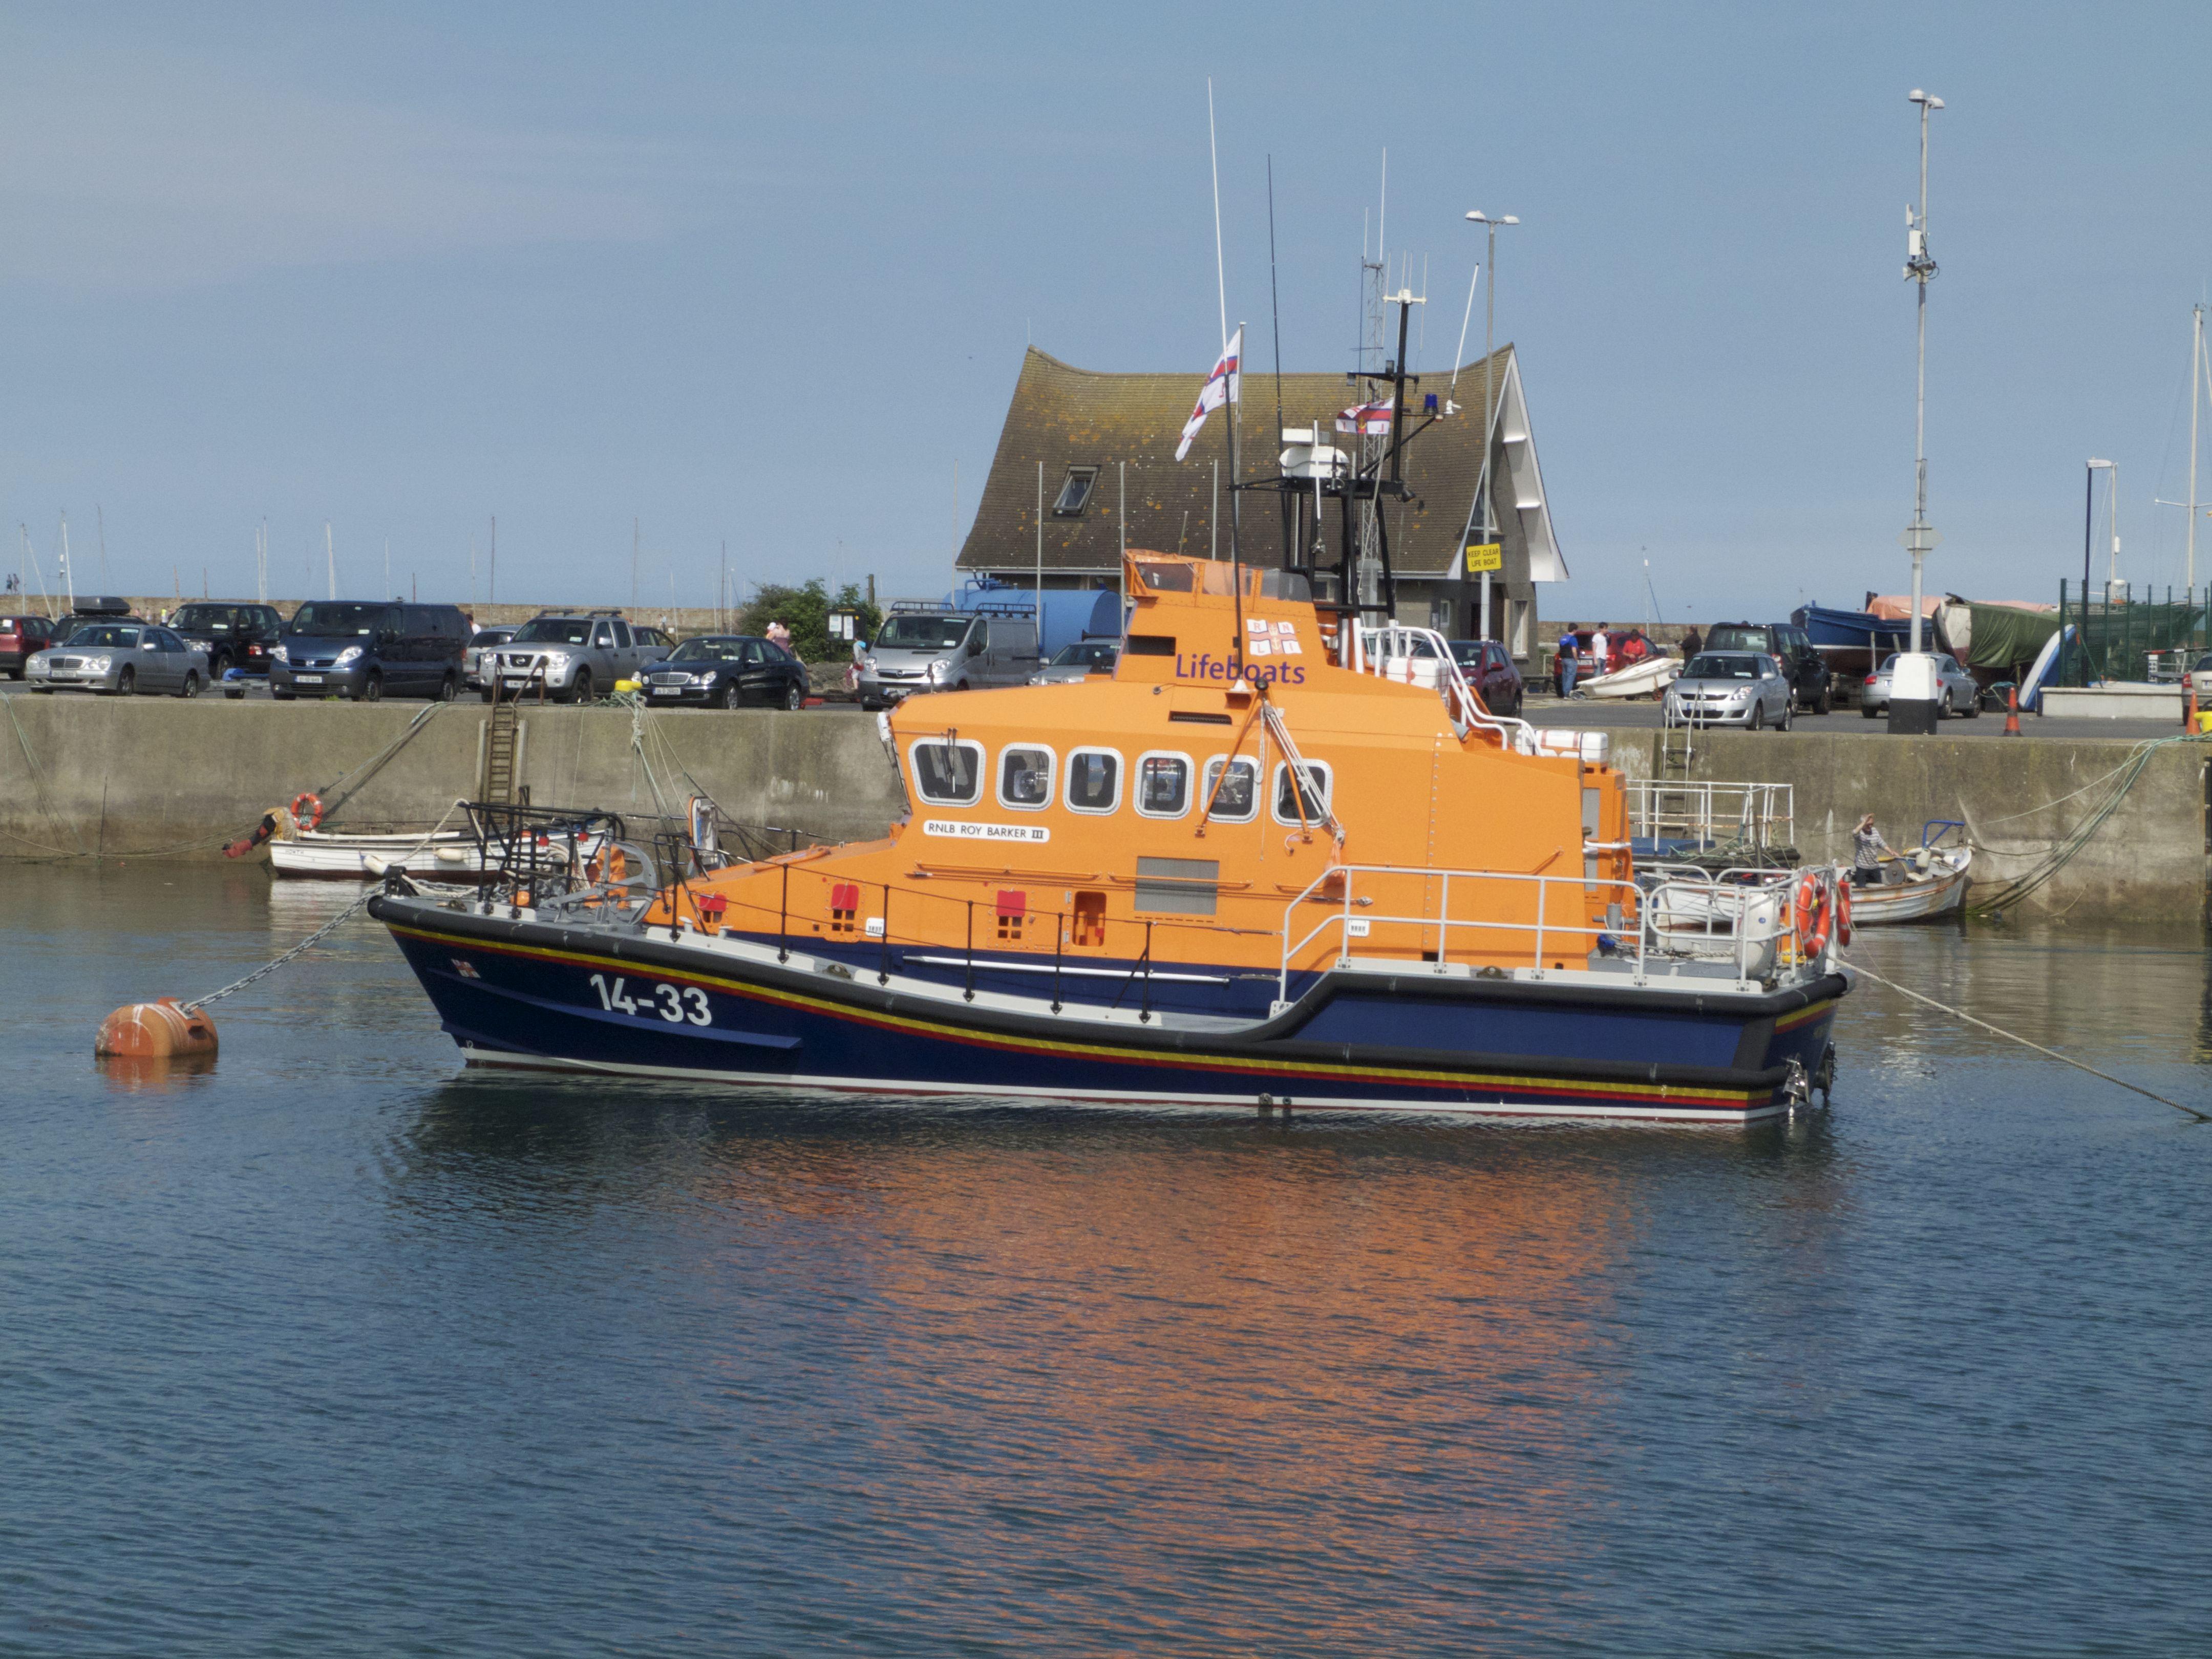 Lifeboat_BNDCC_2013_Bill Henning.jpg